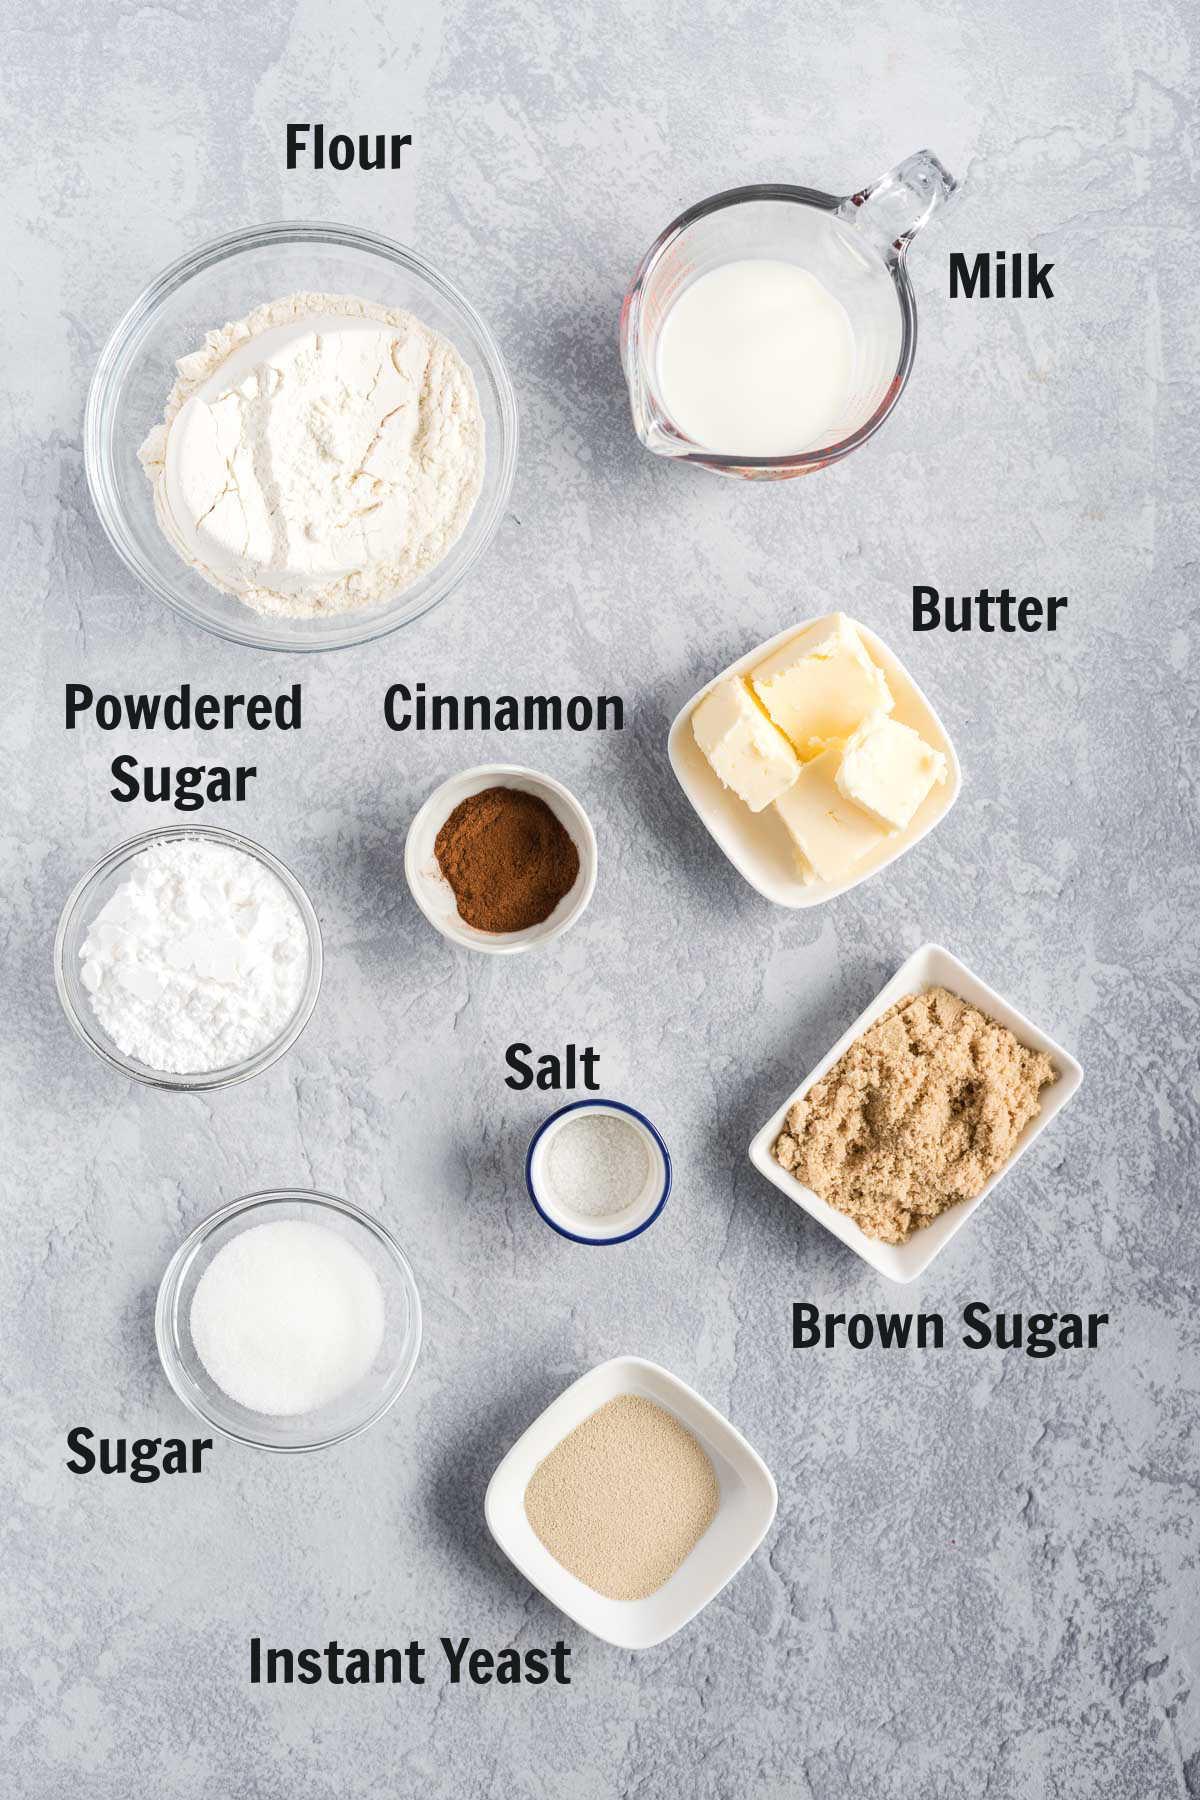 Ingredients to make cinnamon rolls.